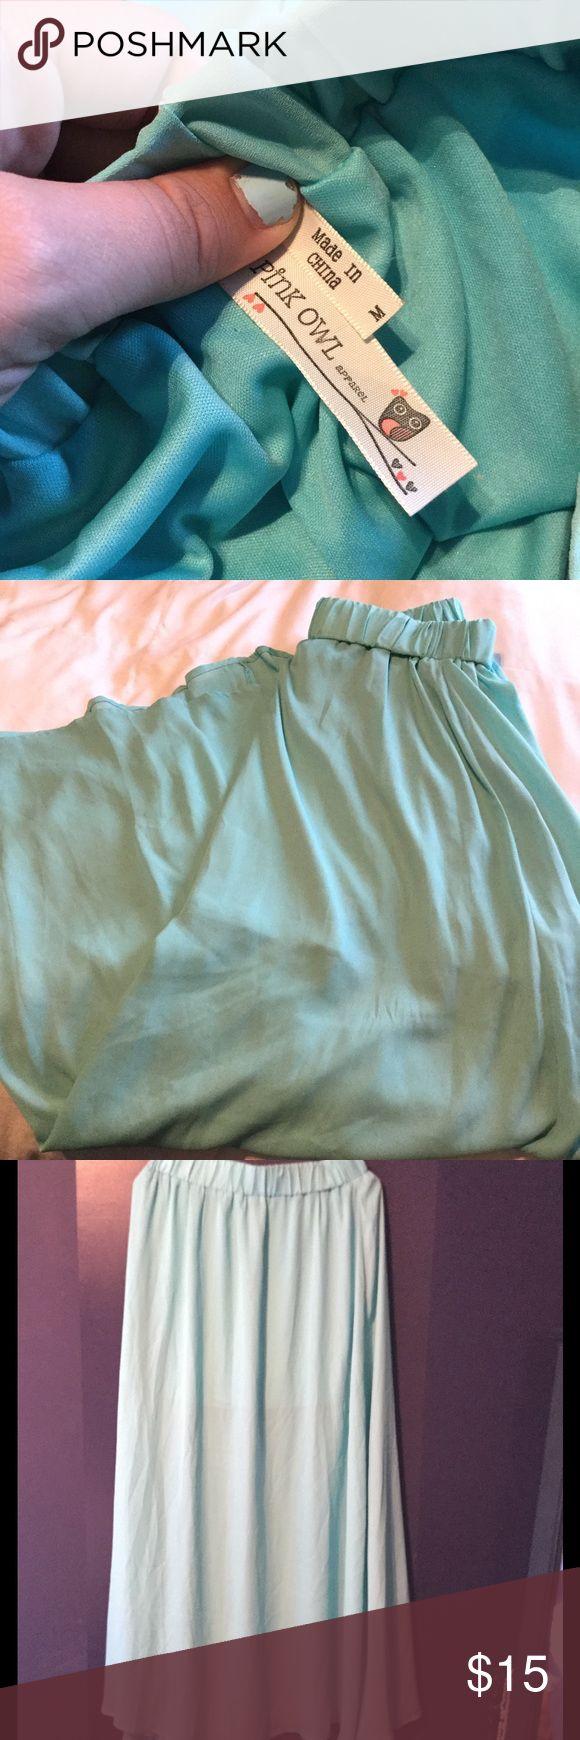 Teal Maxi Skirt Teal colored Maxi skirt pink owl Skirts Maxi